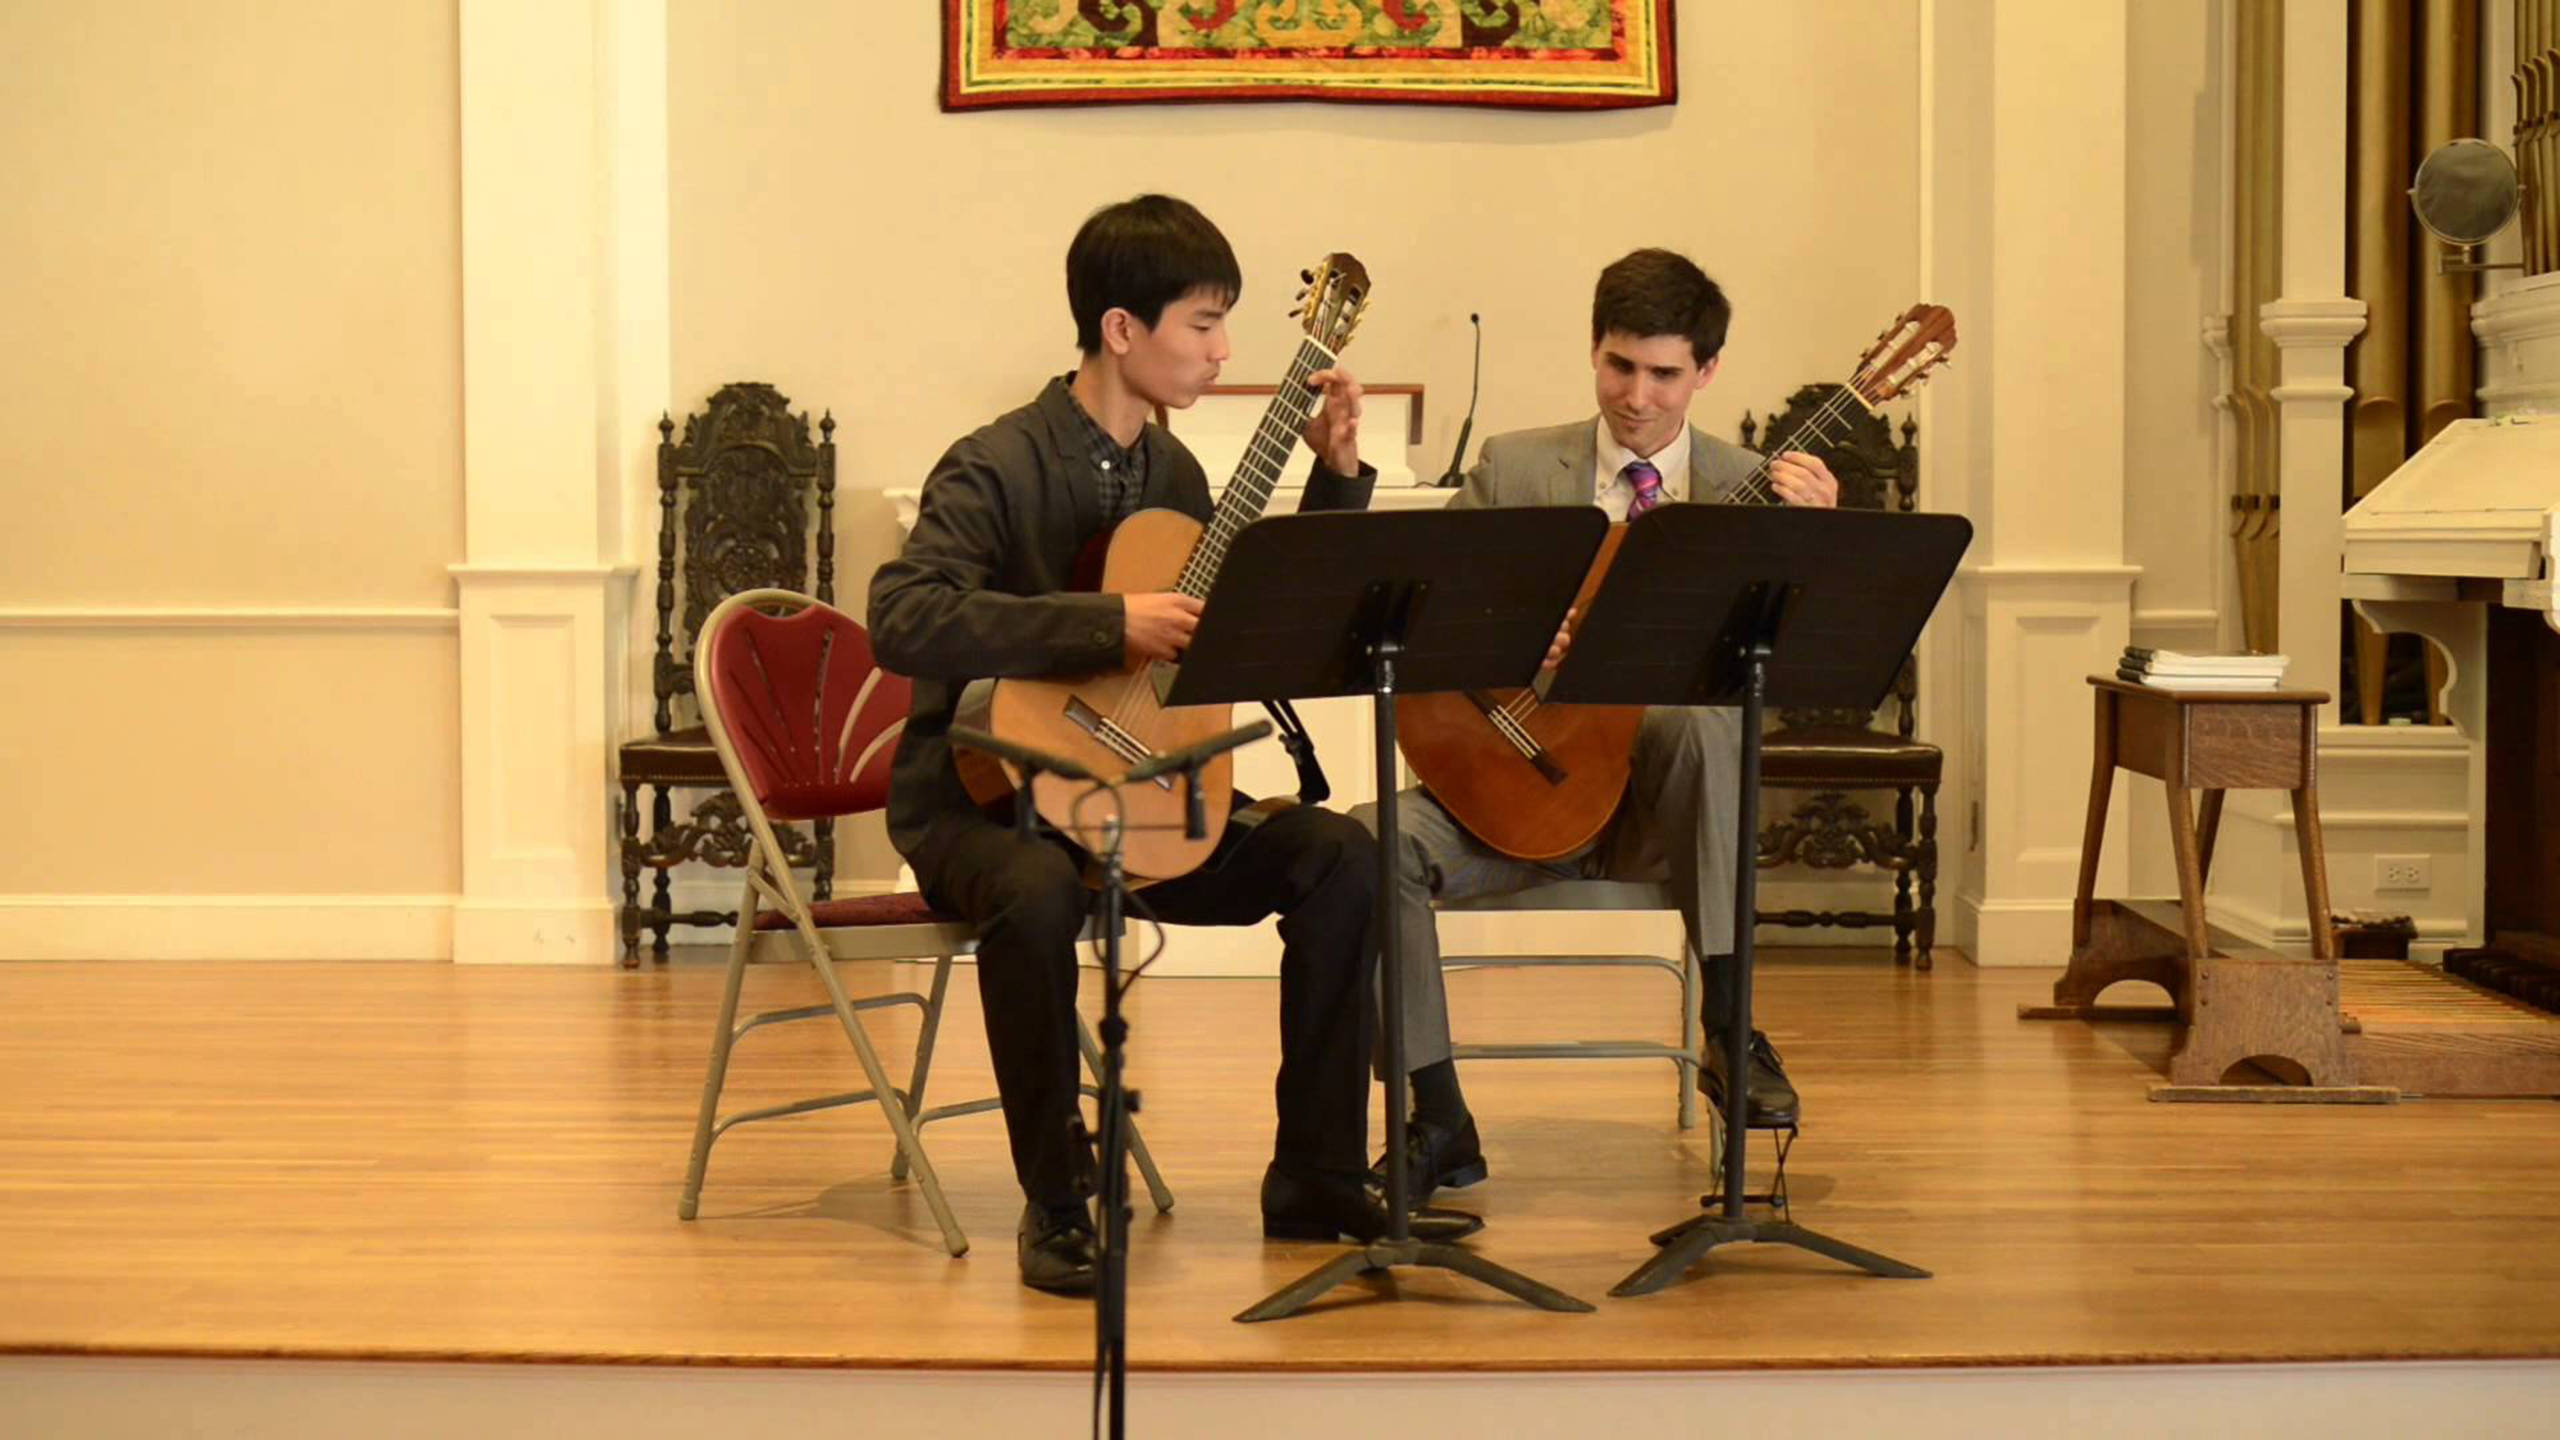 Devin and Robert Wang